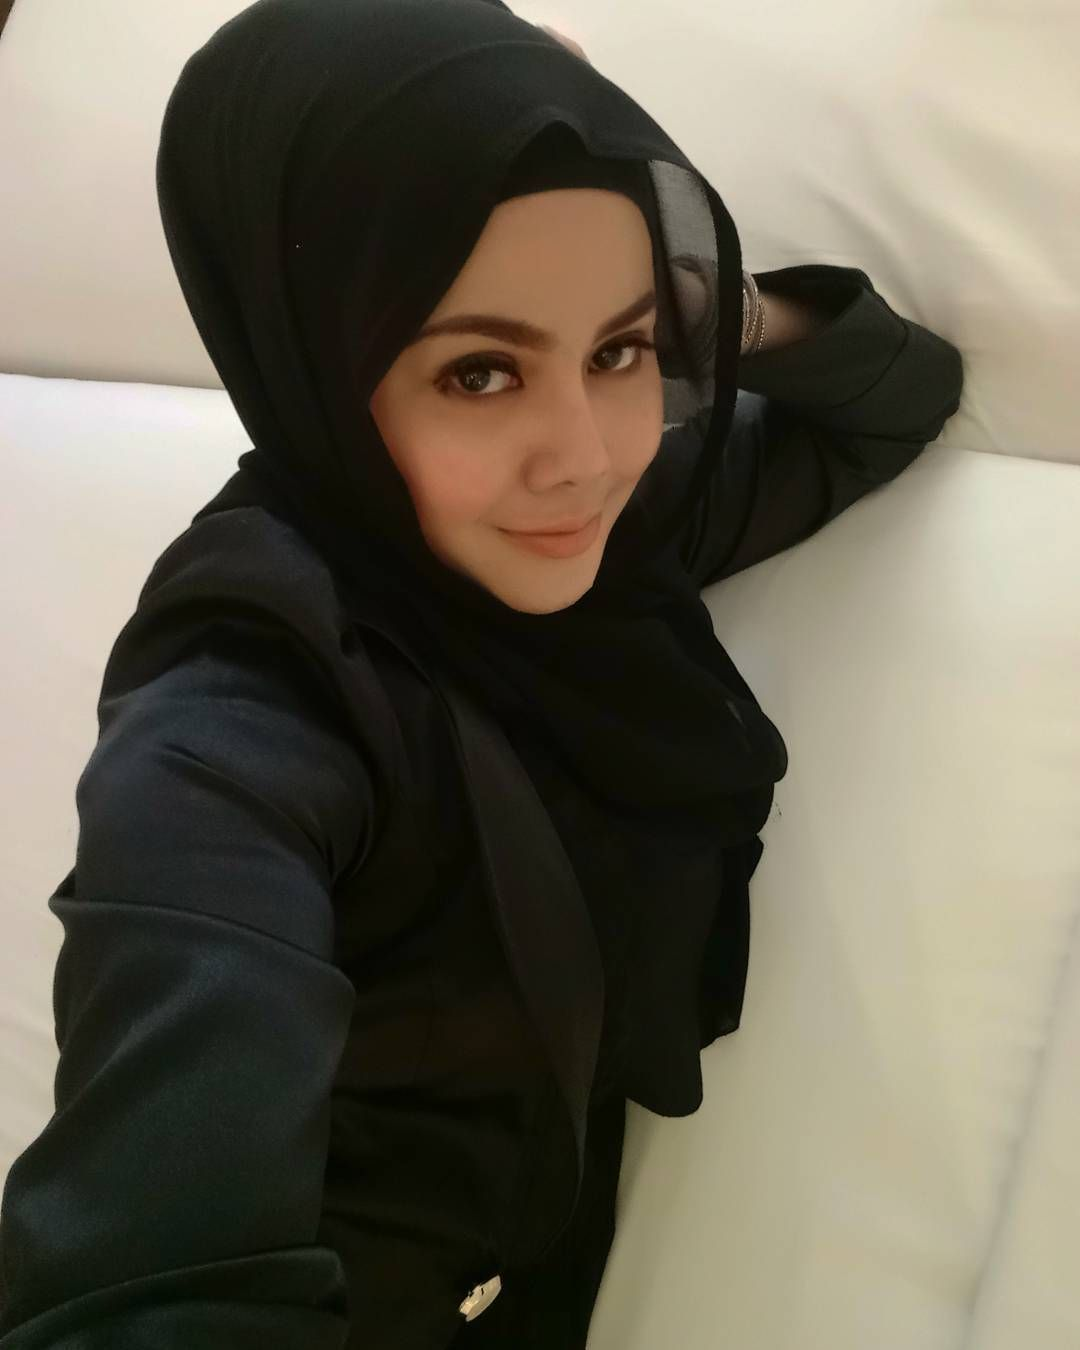 Hijab hot pic opinion you